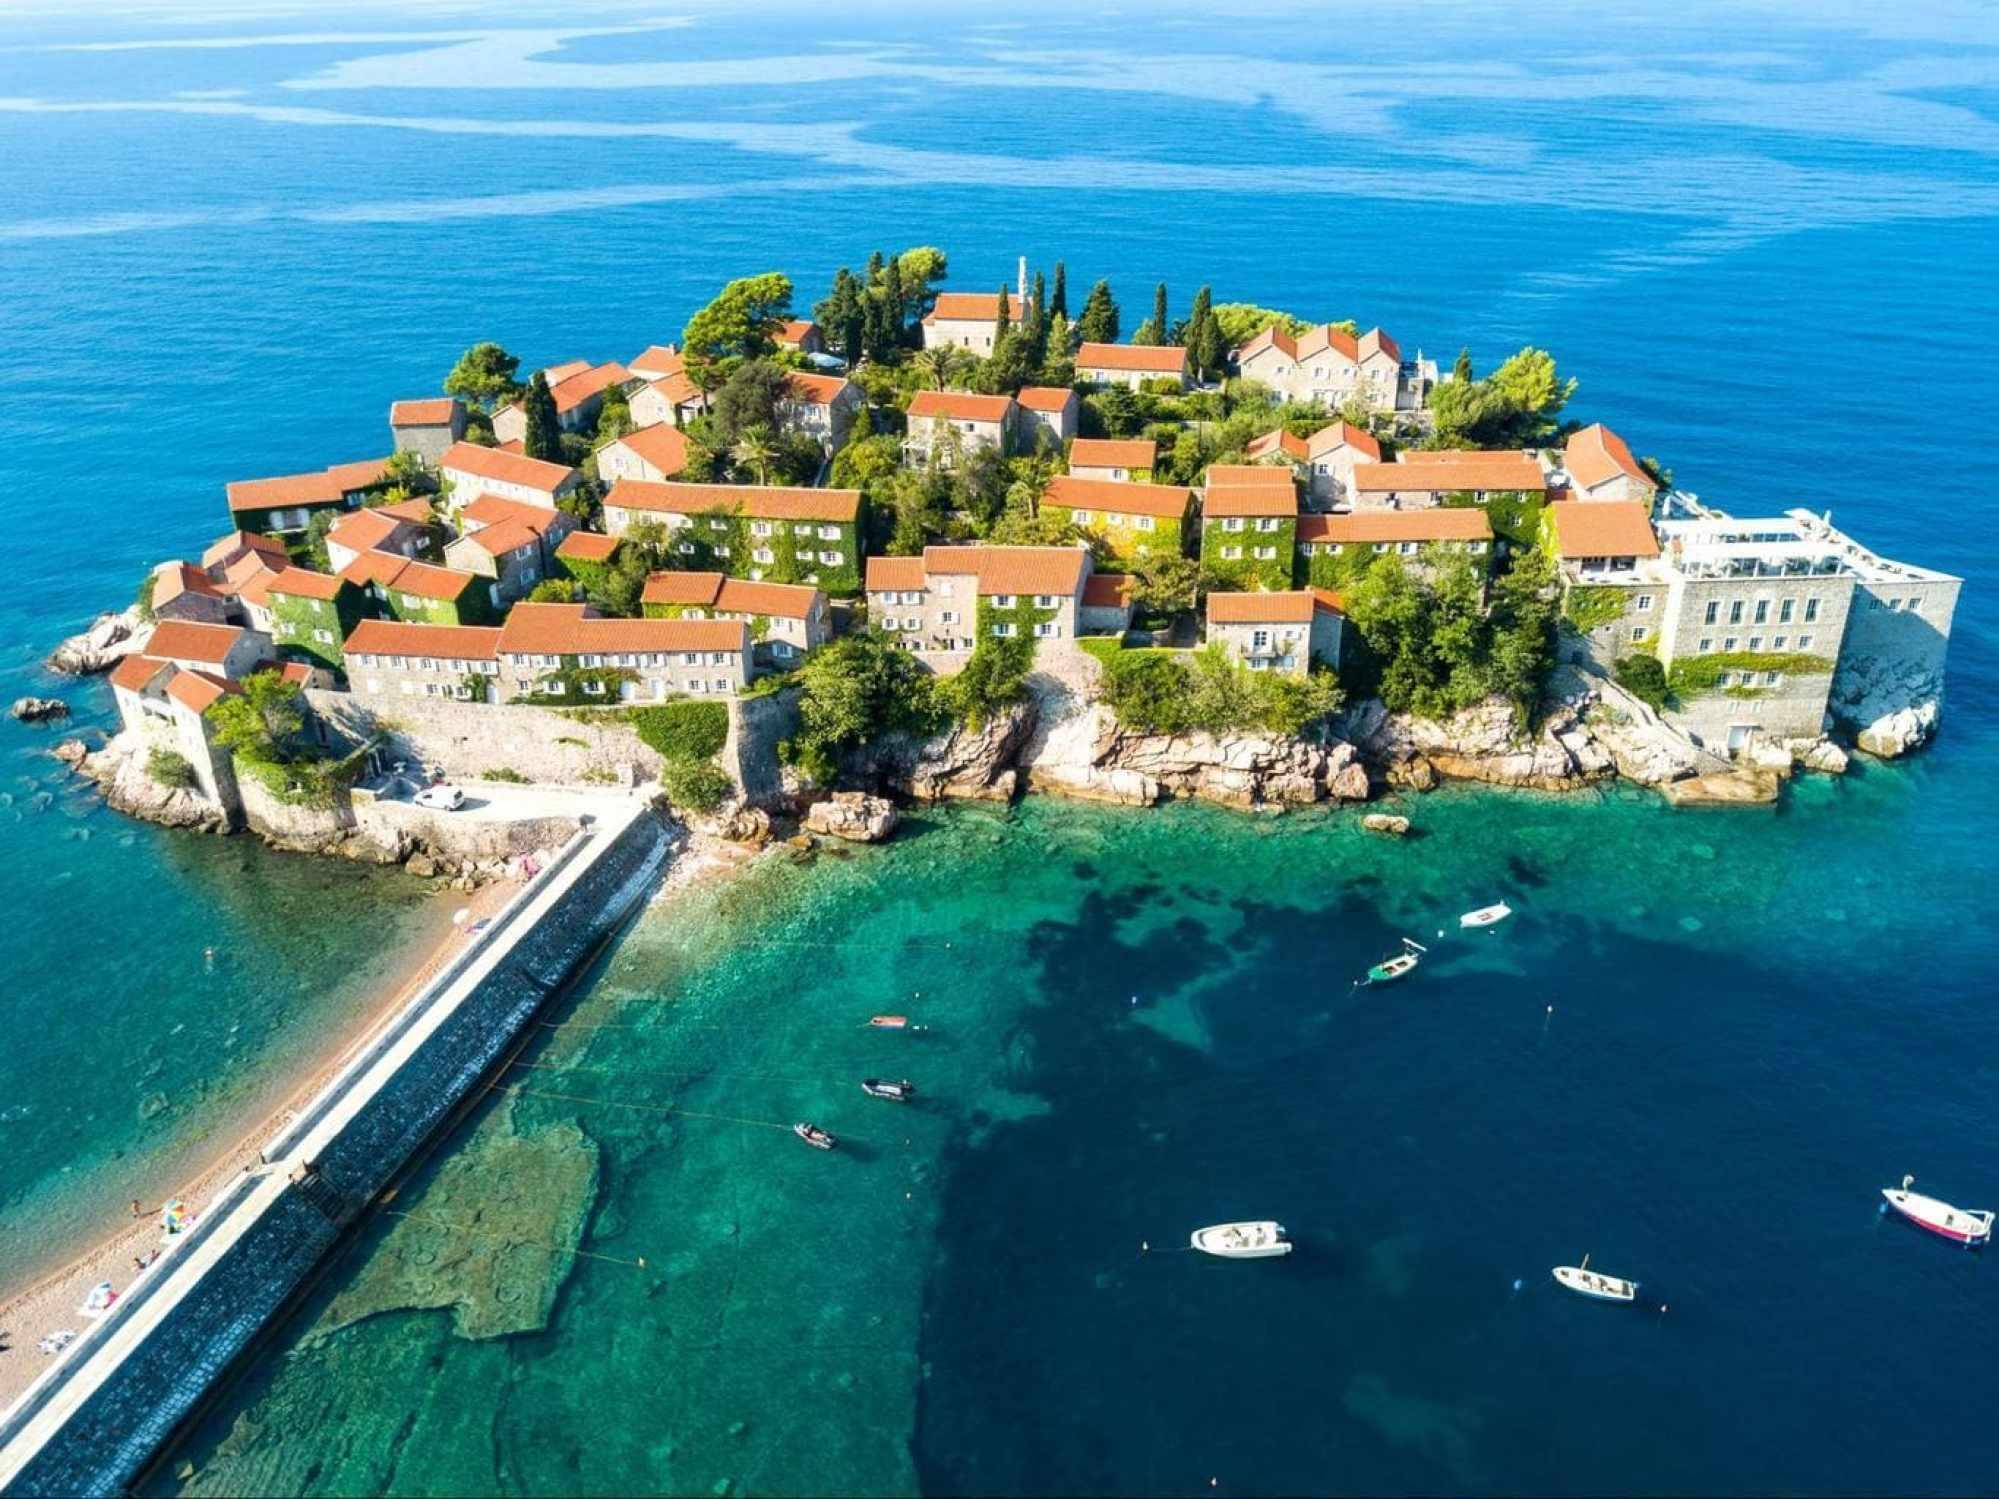 Montenegro's most famous landmark